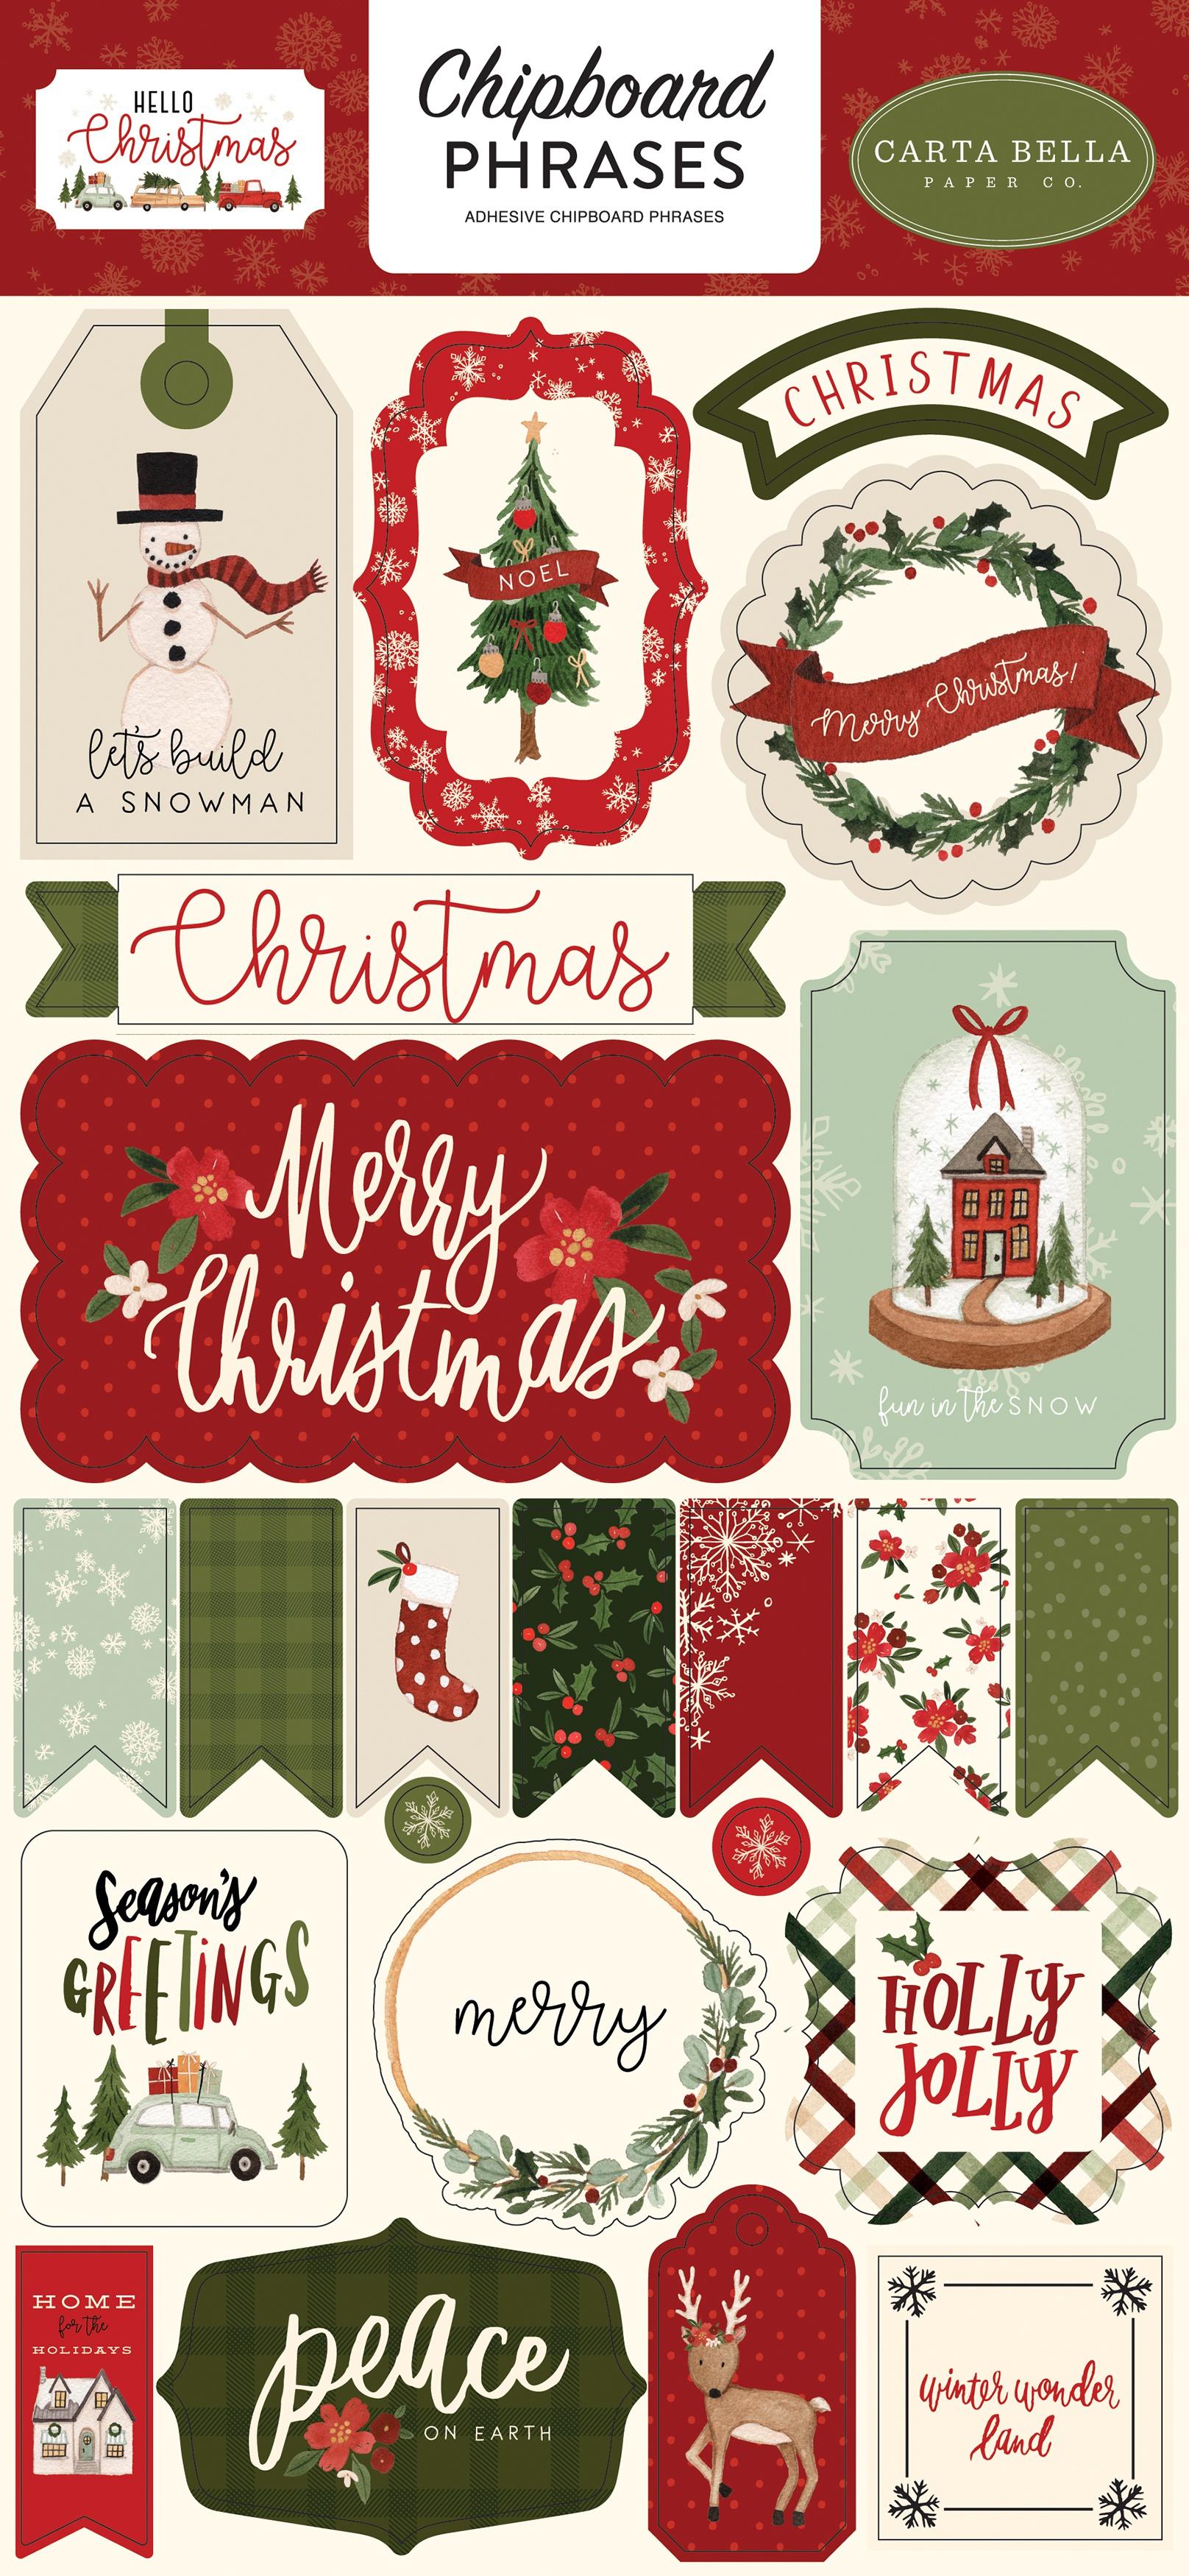 Hello Christmas Chipboard 6X13-Phrases, Hello Christmas